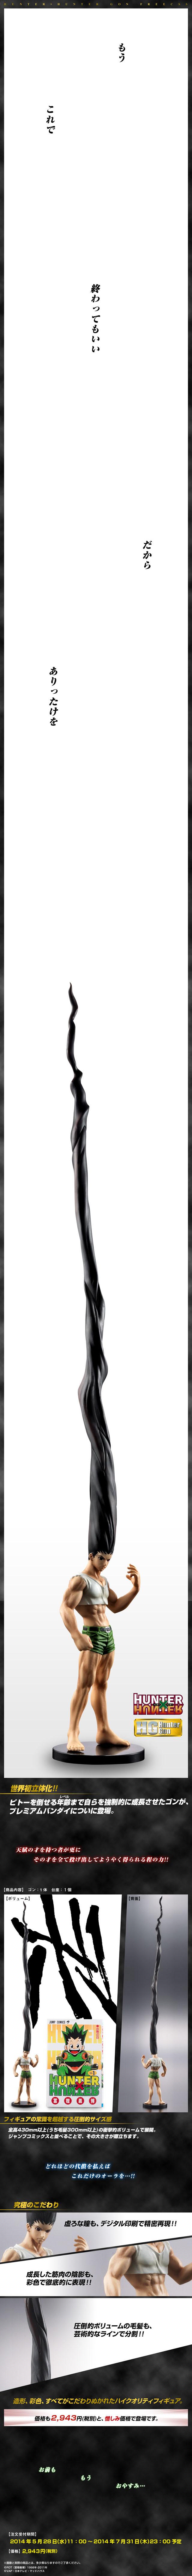 HUNTER×HUNTER獵人大傑小傑覺醒獵人x獵人模型報告上班族富奸休刊People2復刊人2HUNTER×HUNTERゴン巨人隆基努斯之槍彩虹小馬針灸佛地魔頭髮